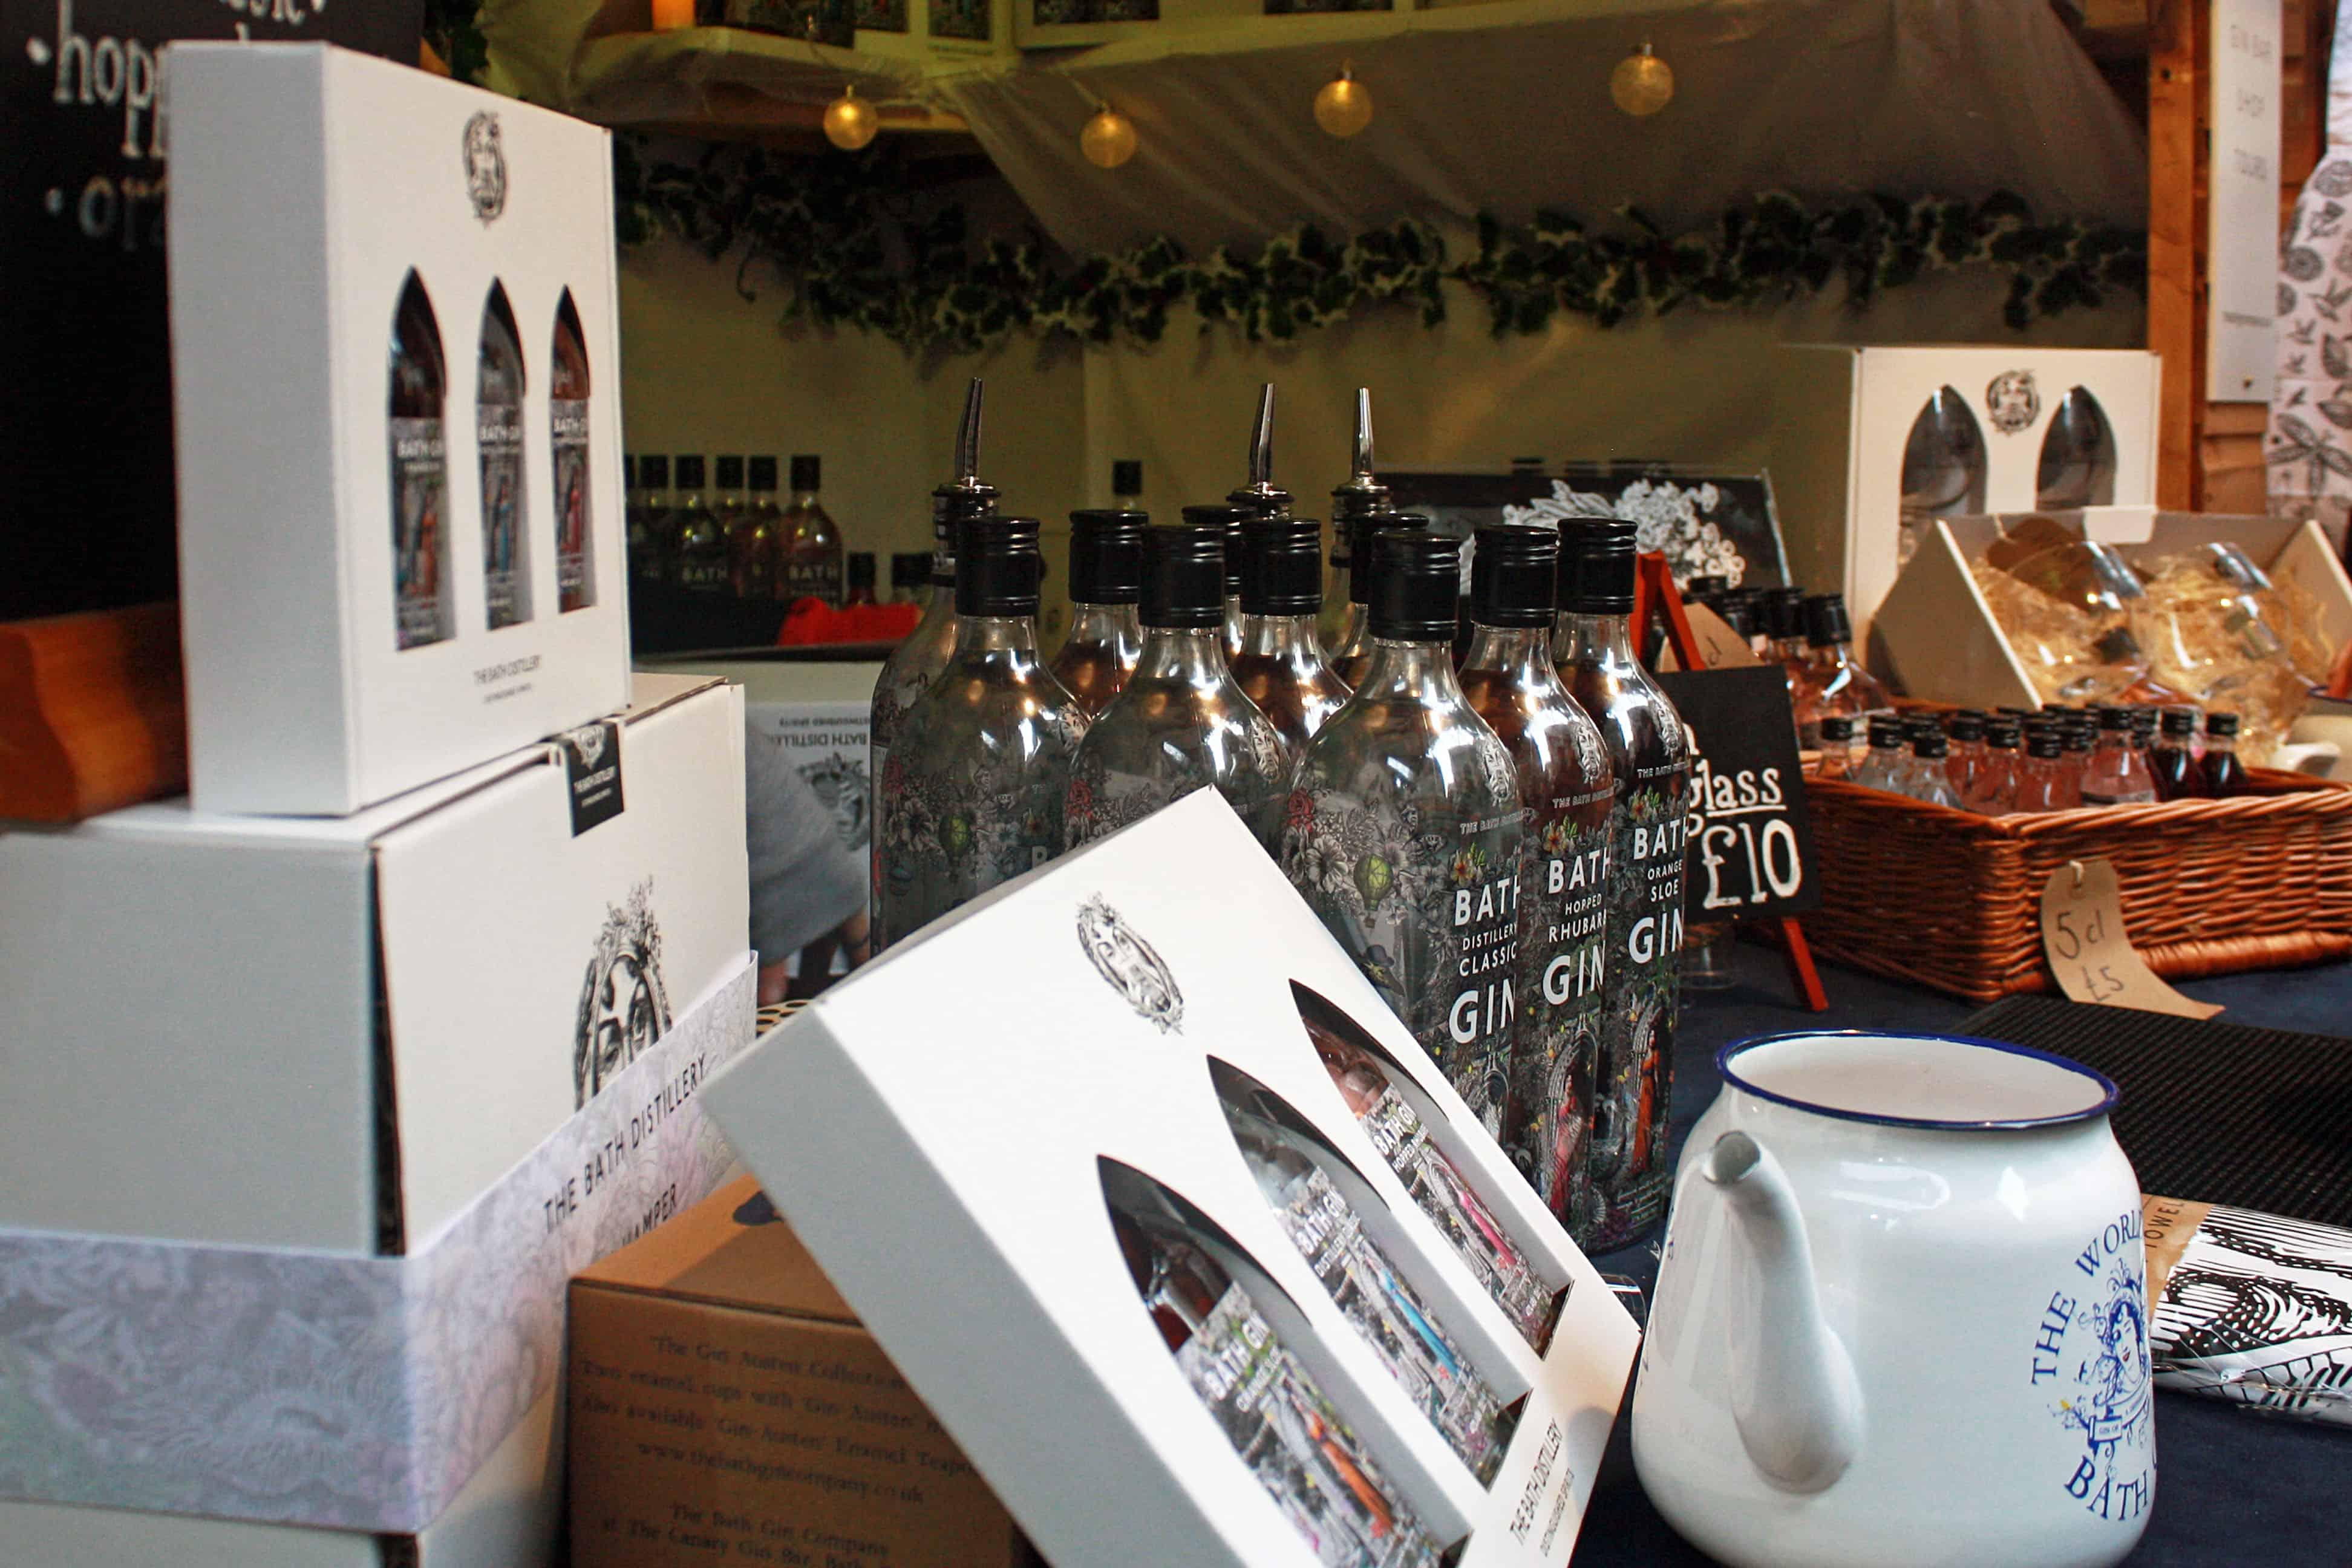 Bath Gin stall, Bath Christmas Market